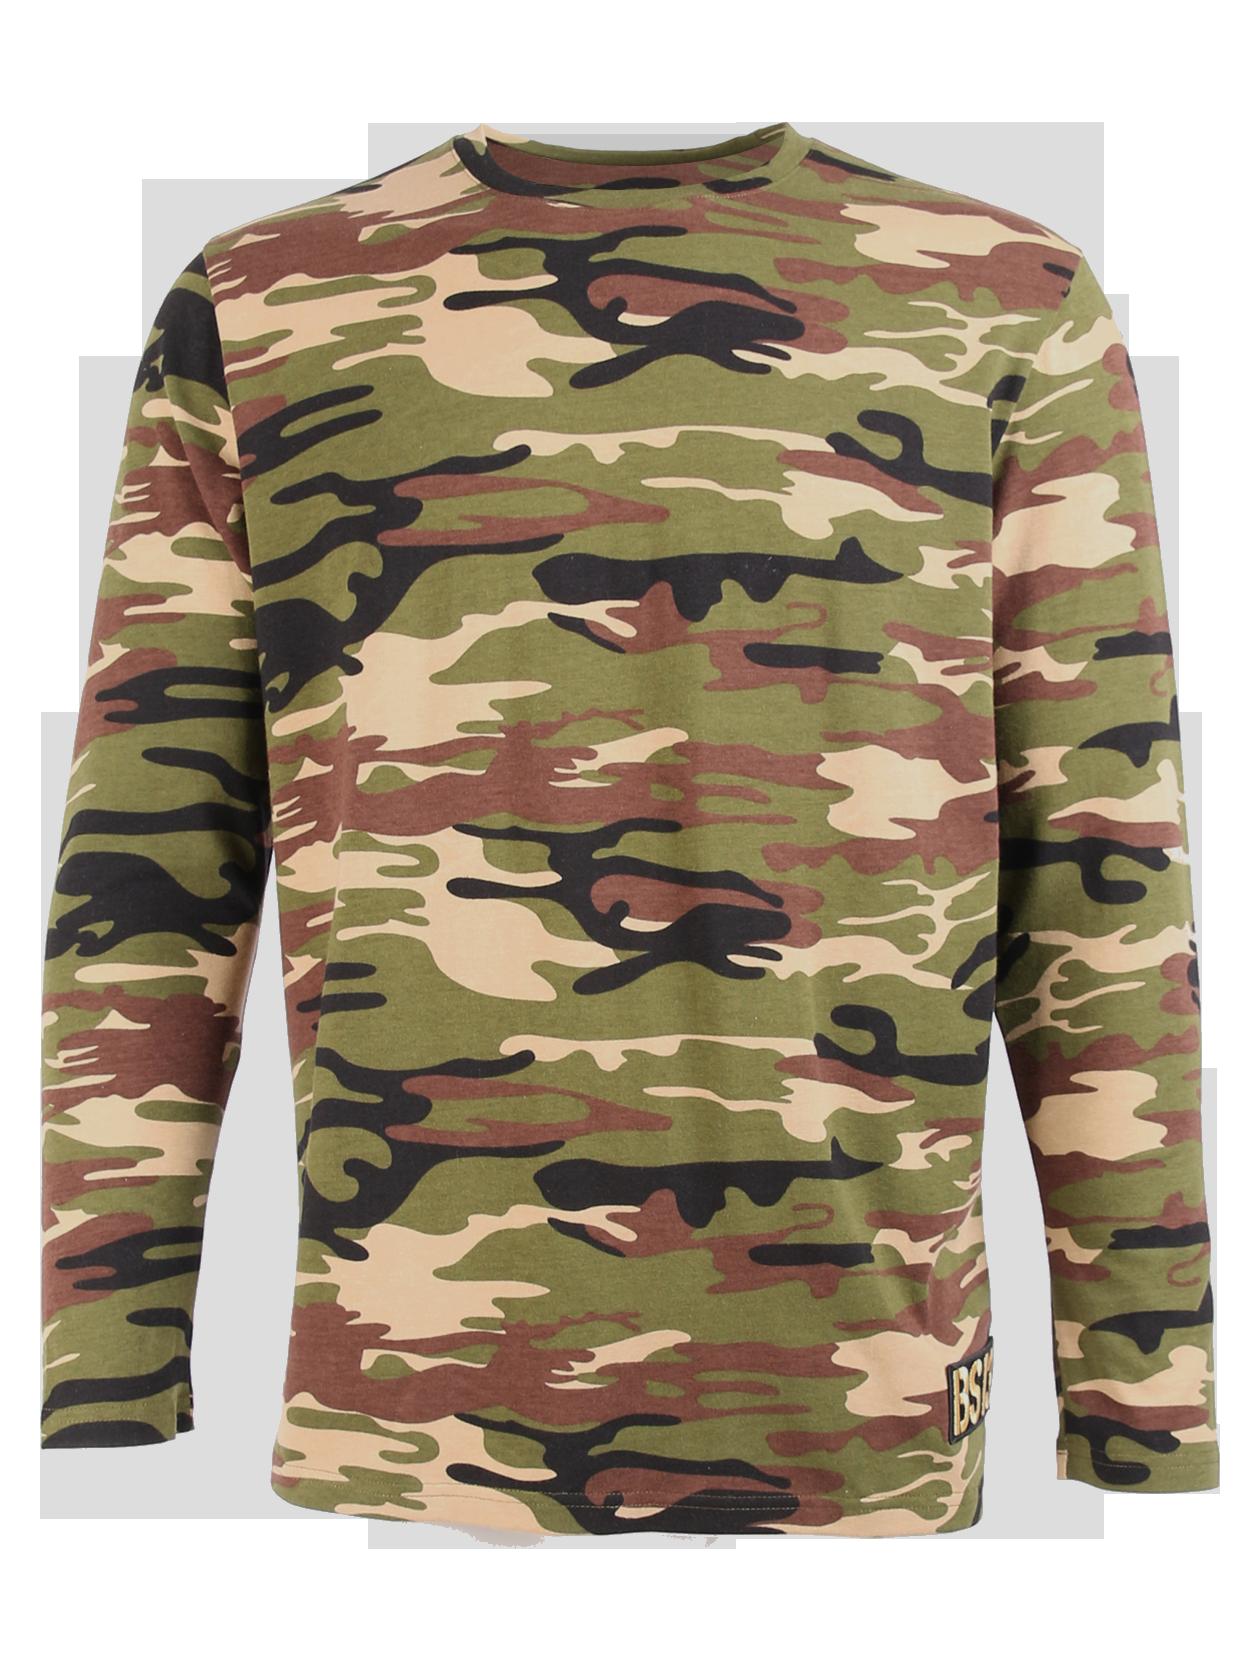 Mens long sleeve t-shirt Camo Patch